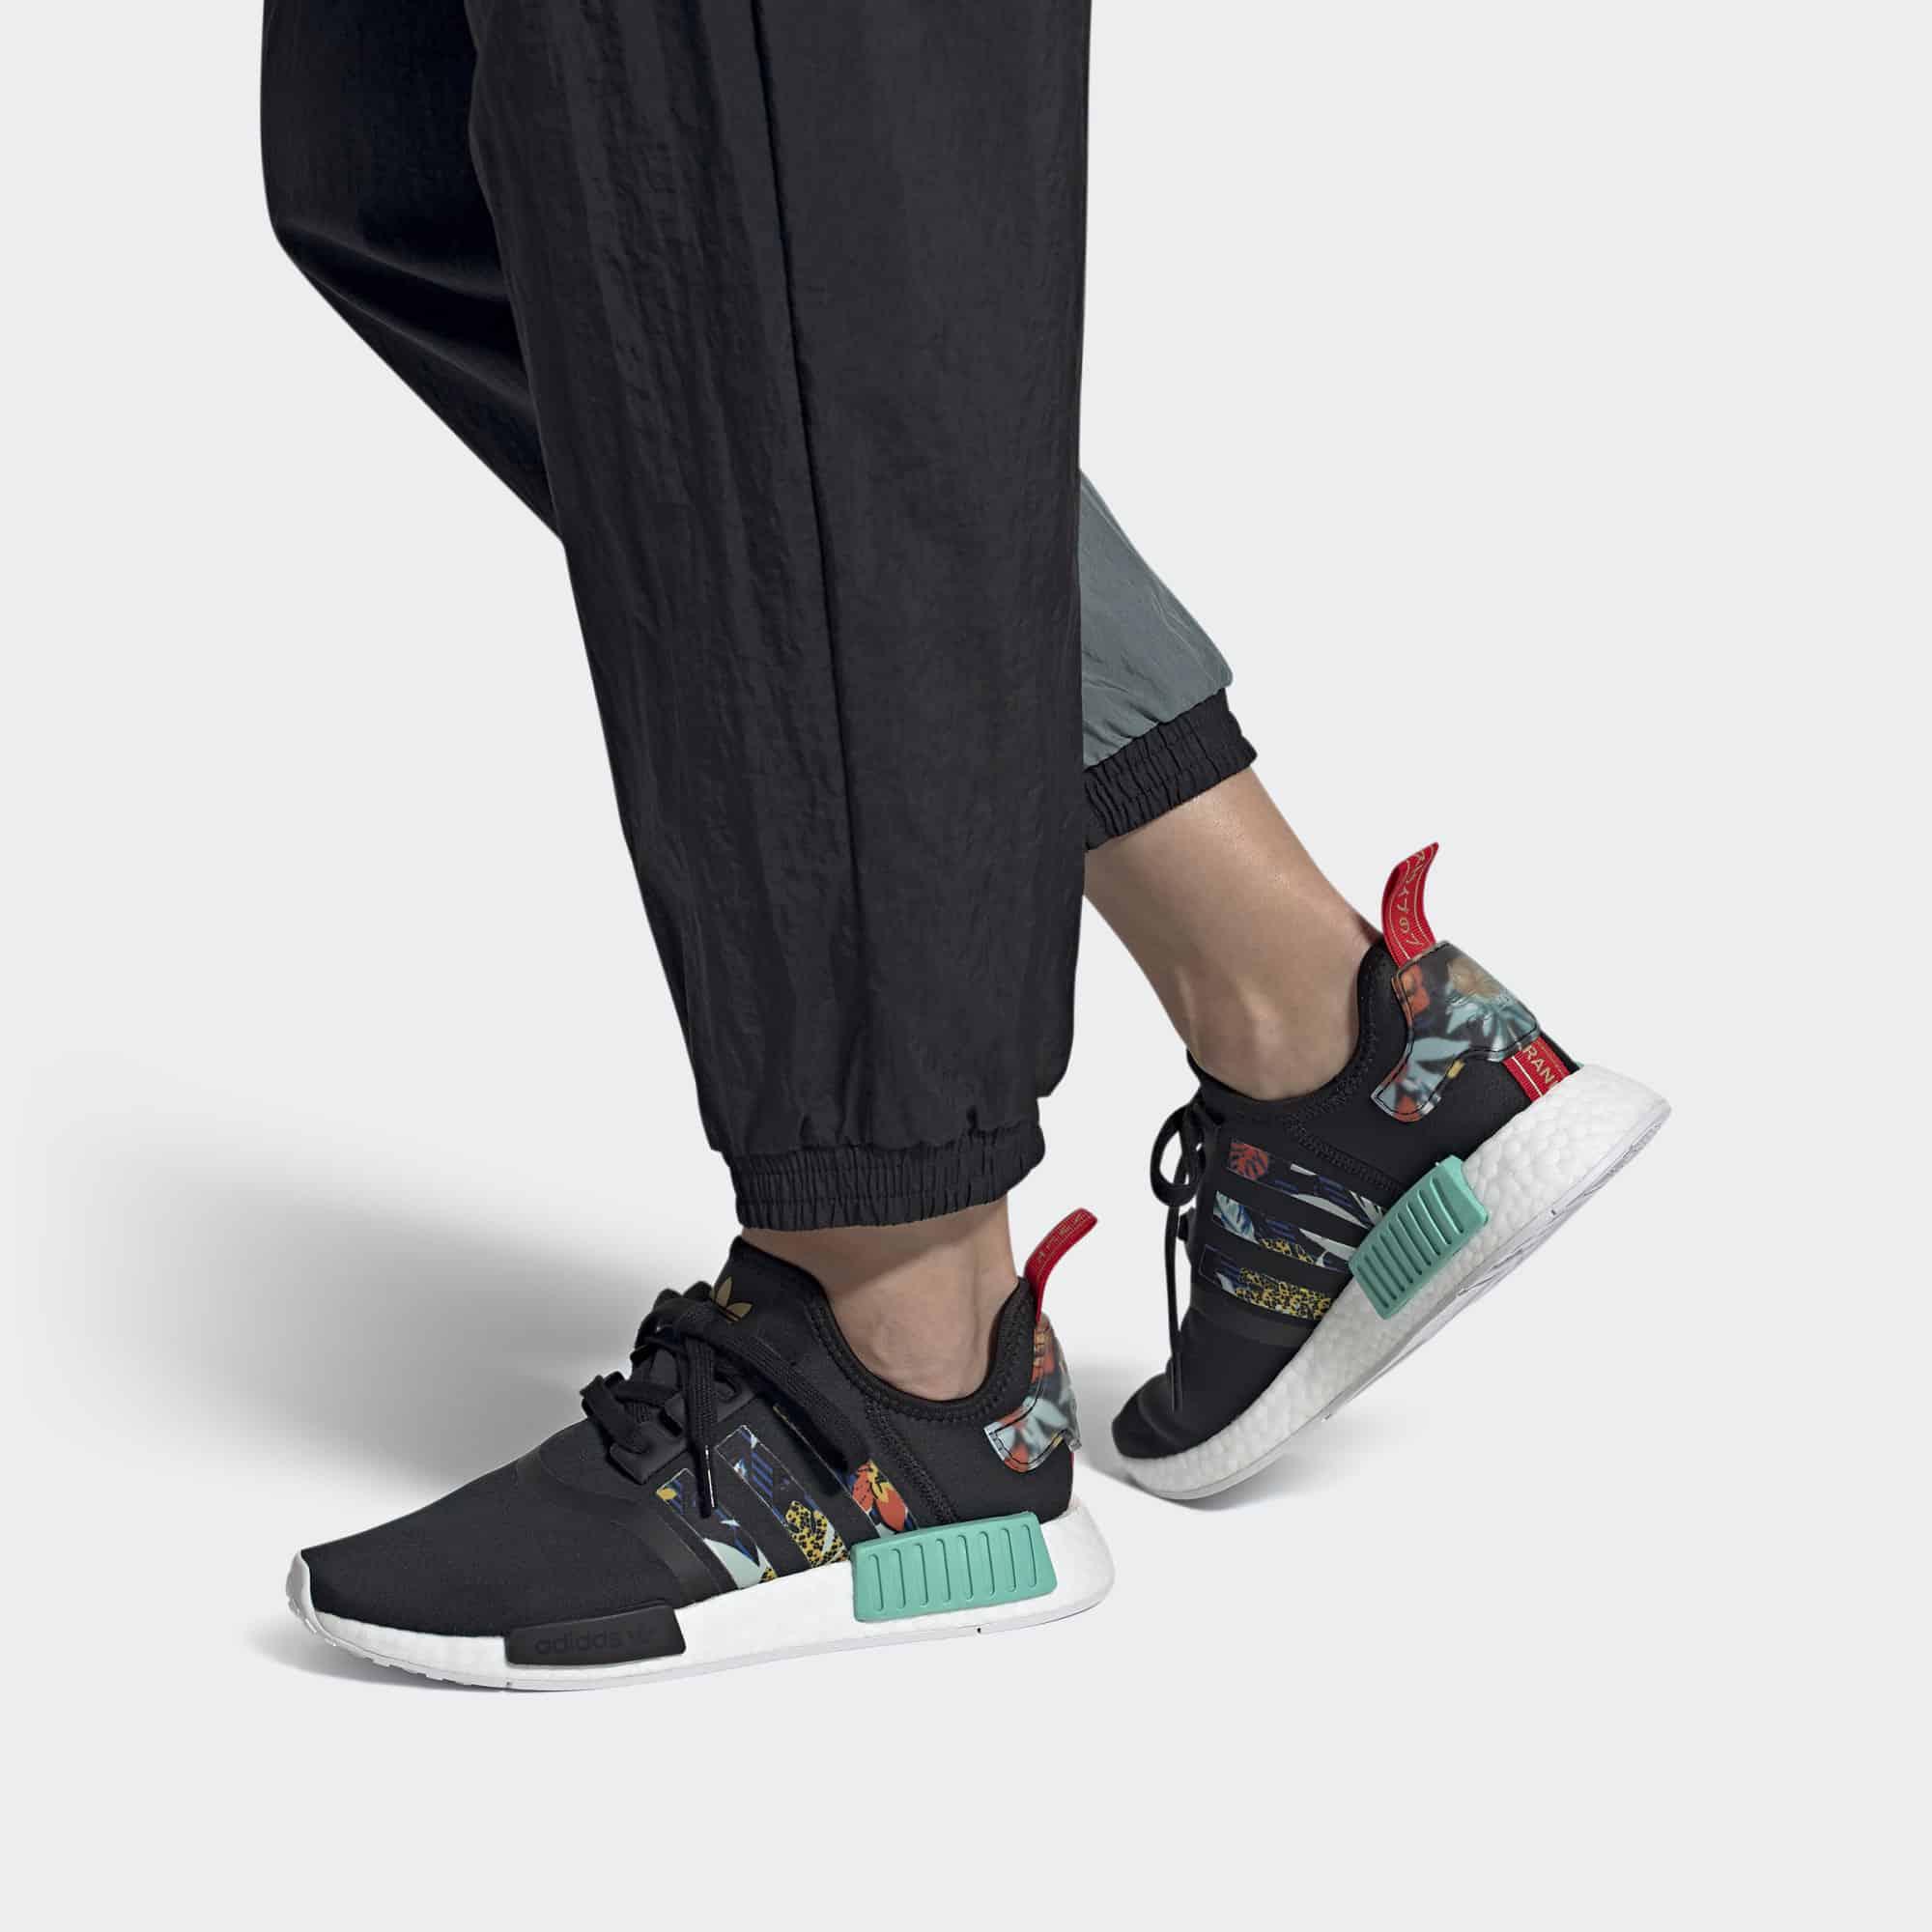 Womens Adidas NMD R1 HER Studios On Feet